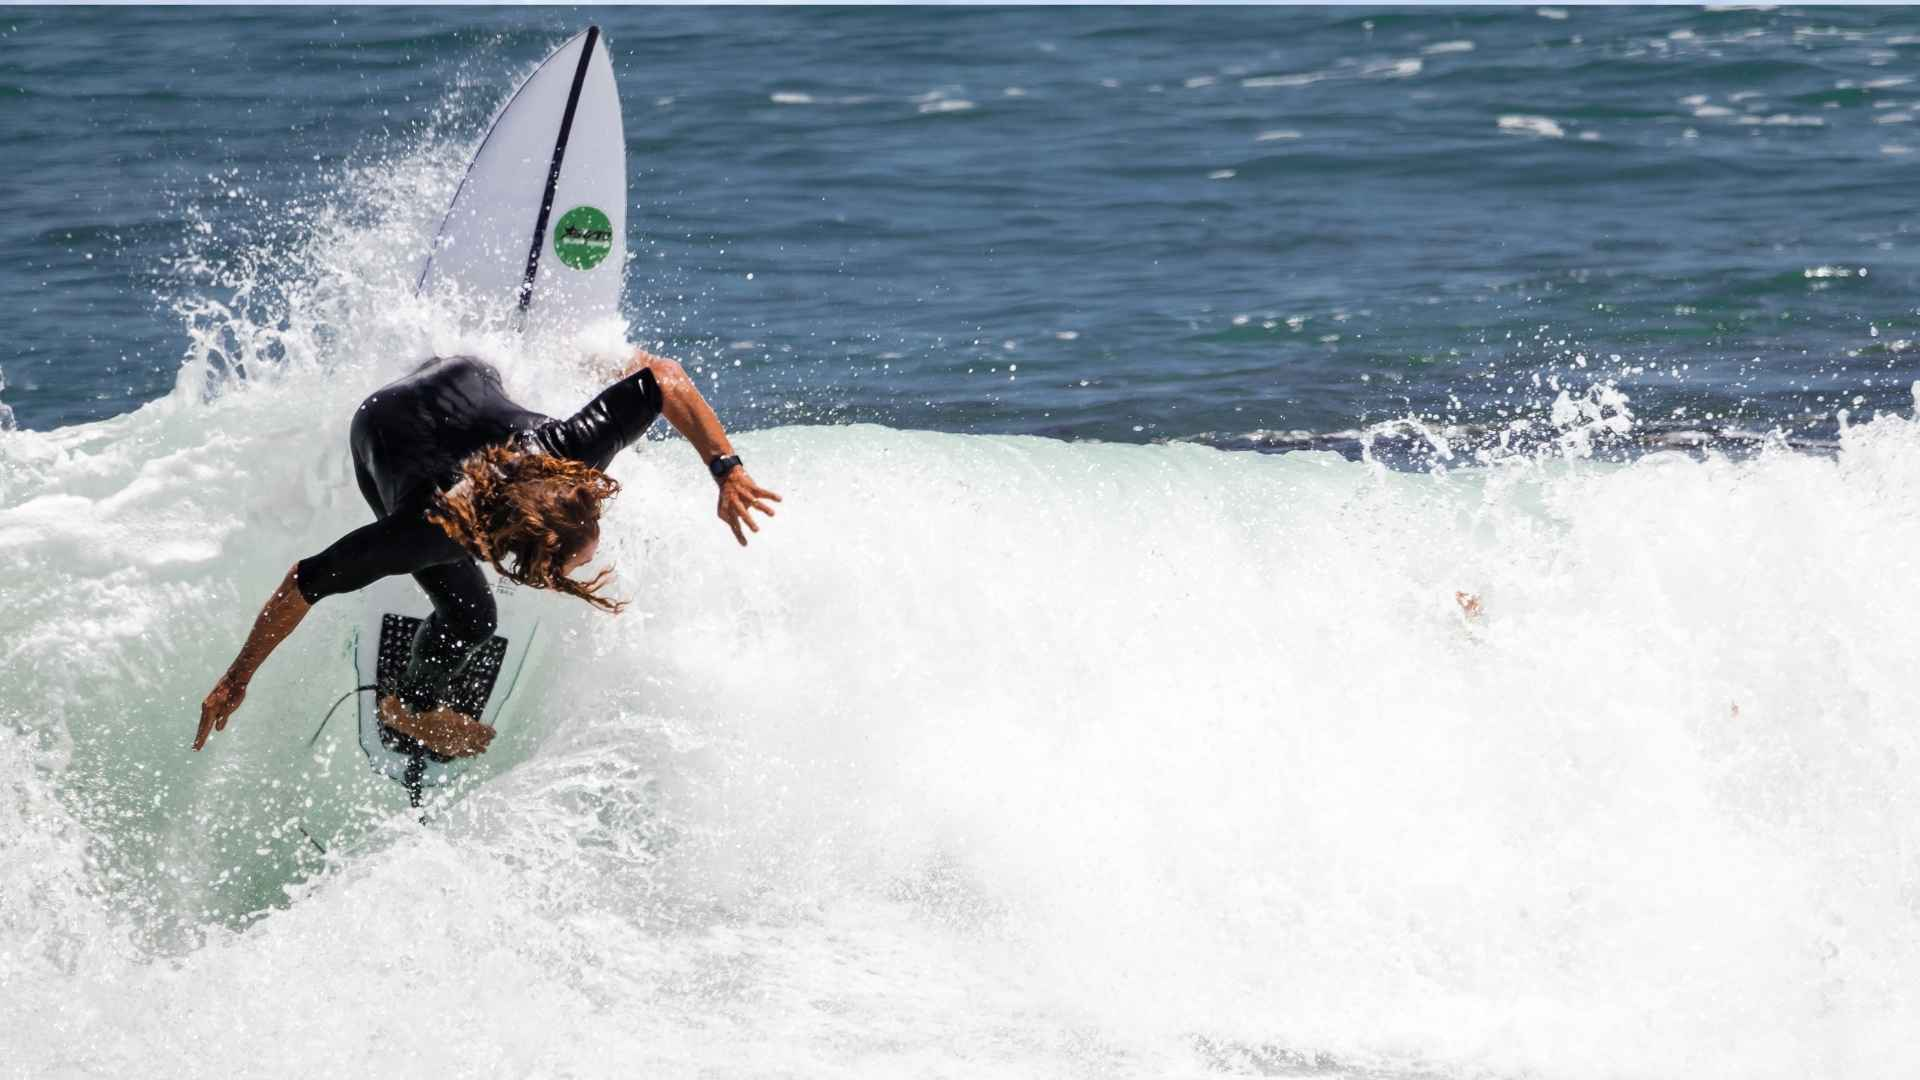 Surfing scene near perth